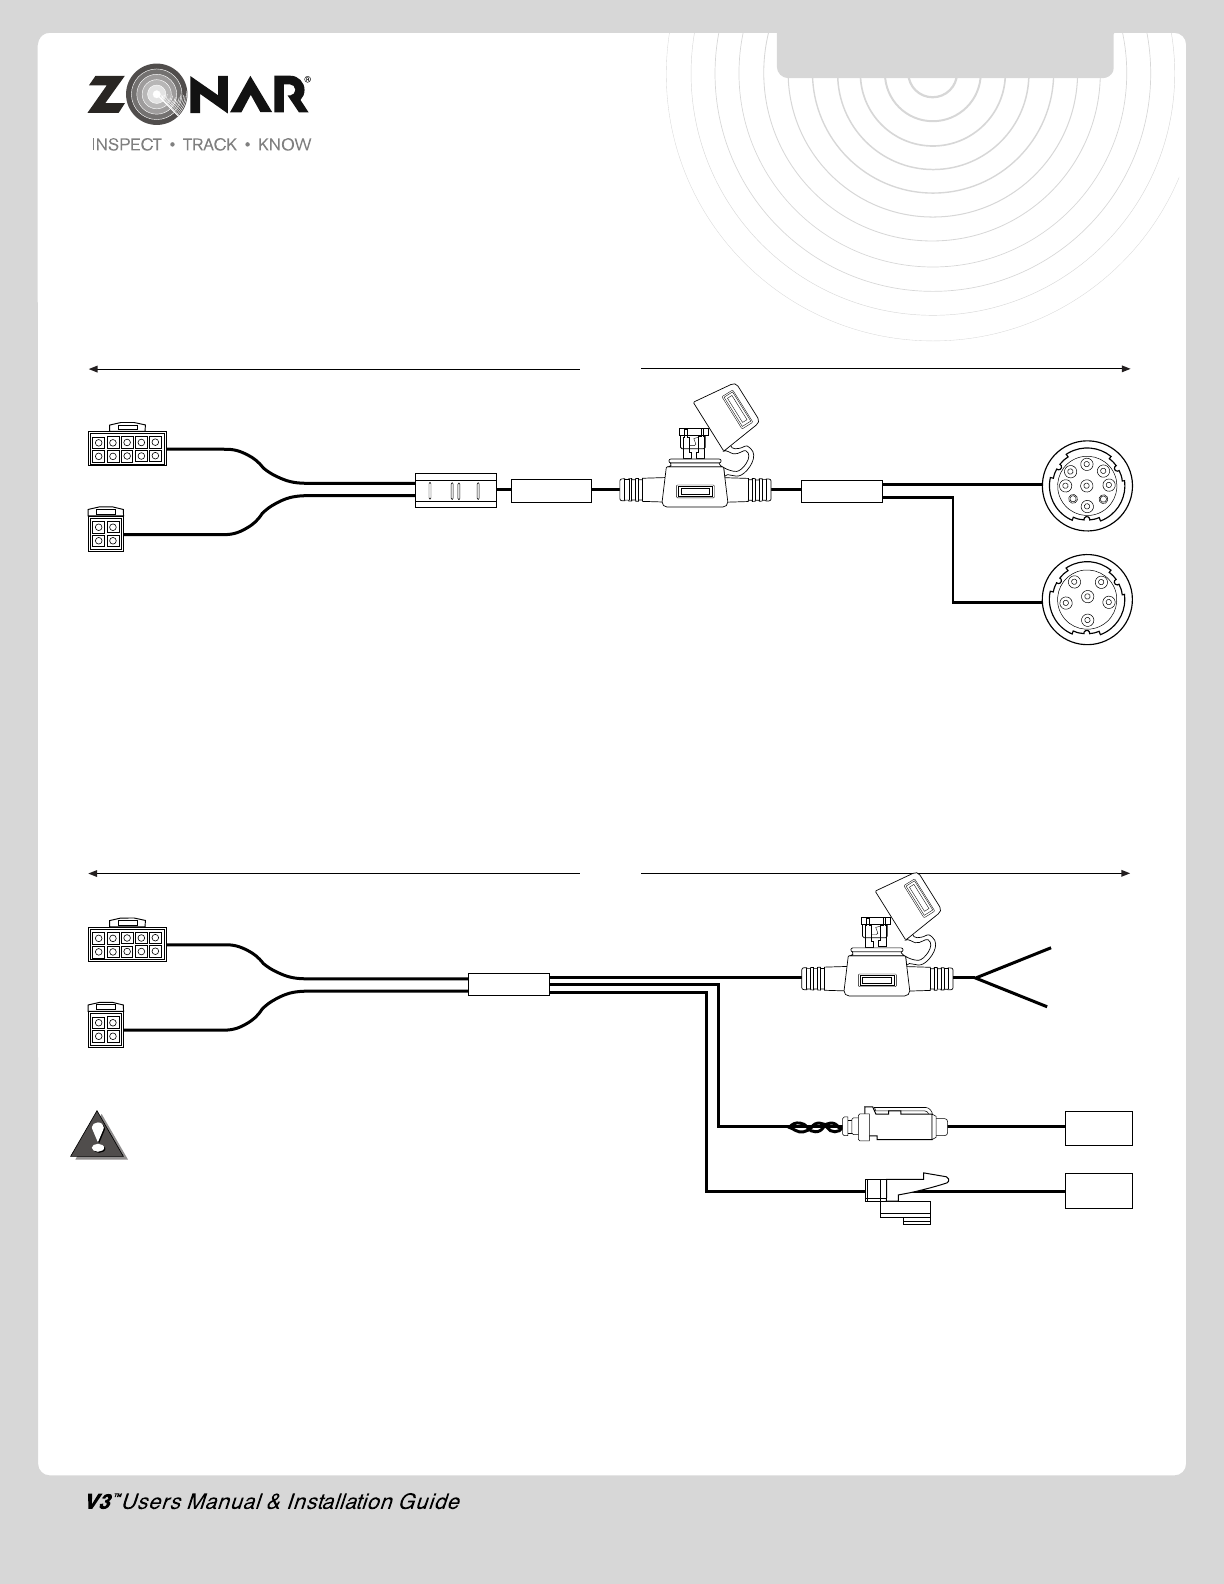 Zonar Systems V3 V3 User Manual Final Version on cadec wiring diagram, gps wiring diagram, peoplenet wiring diagram, qualcomm wiring diagram,